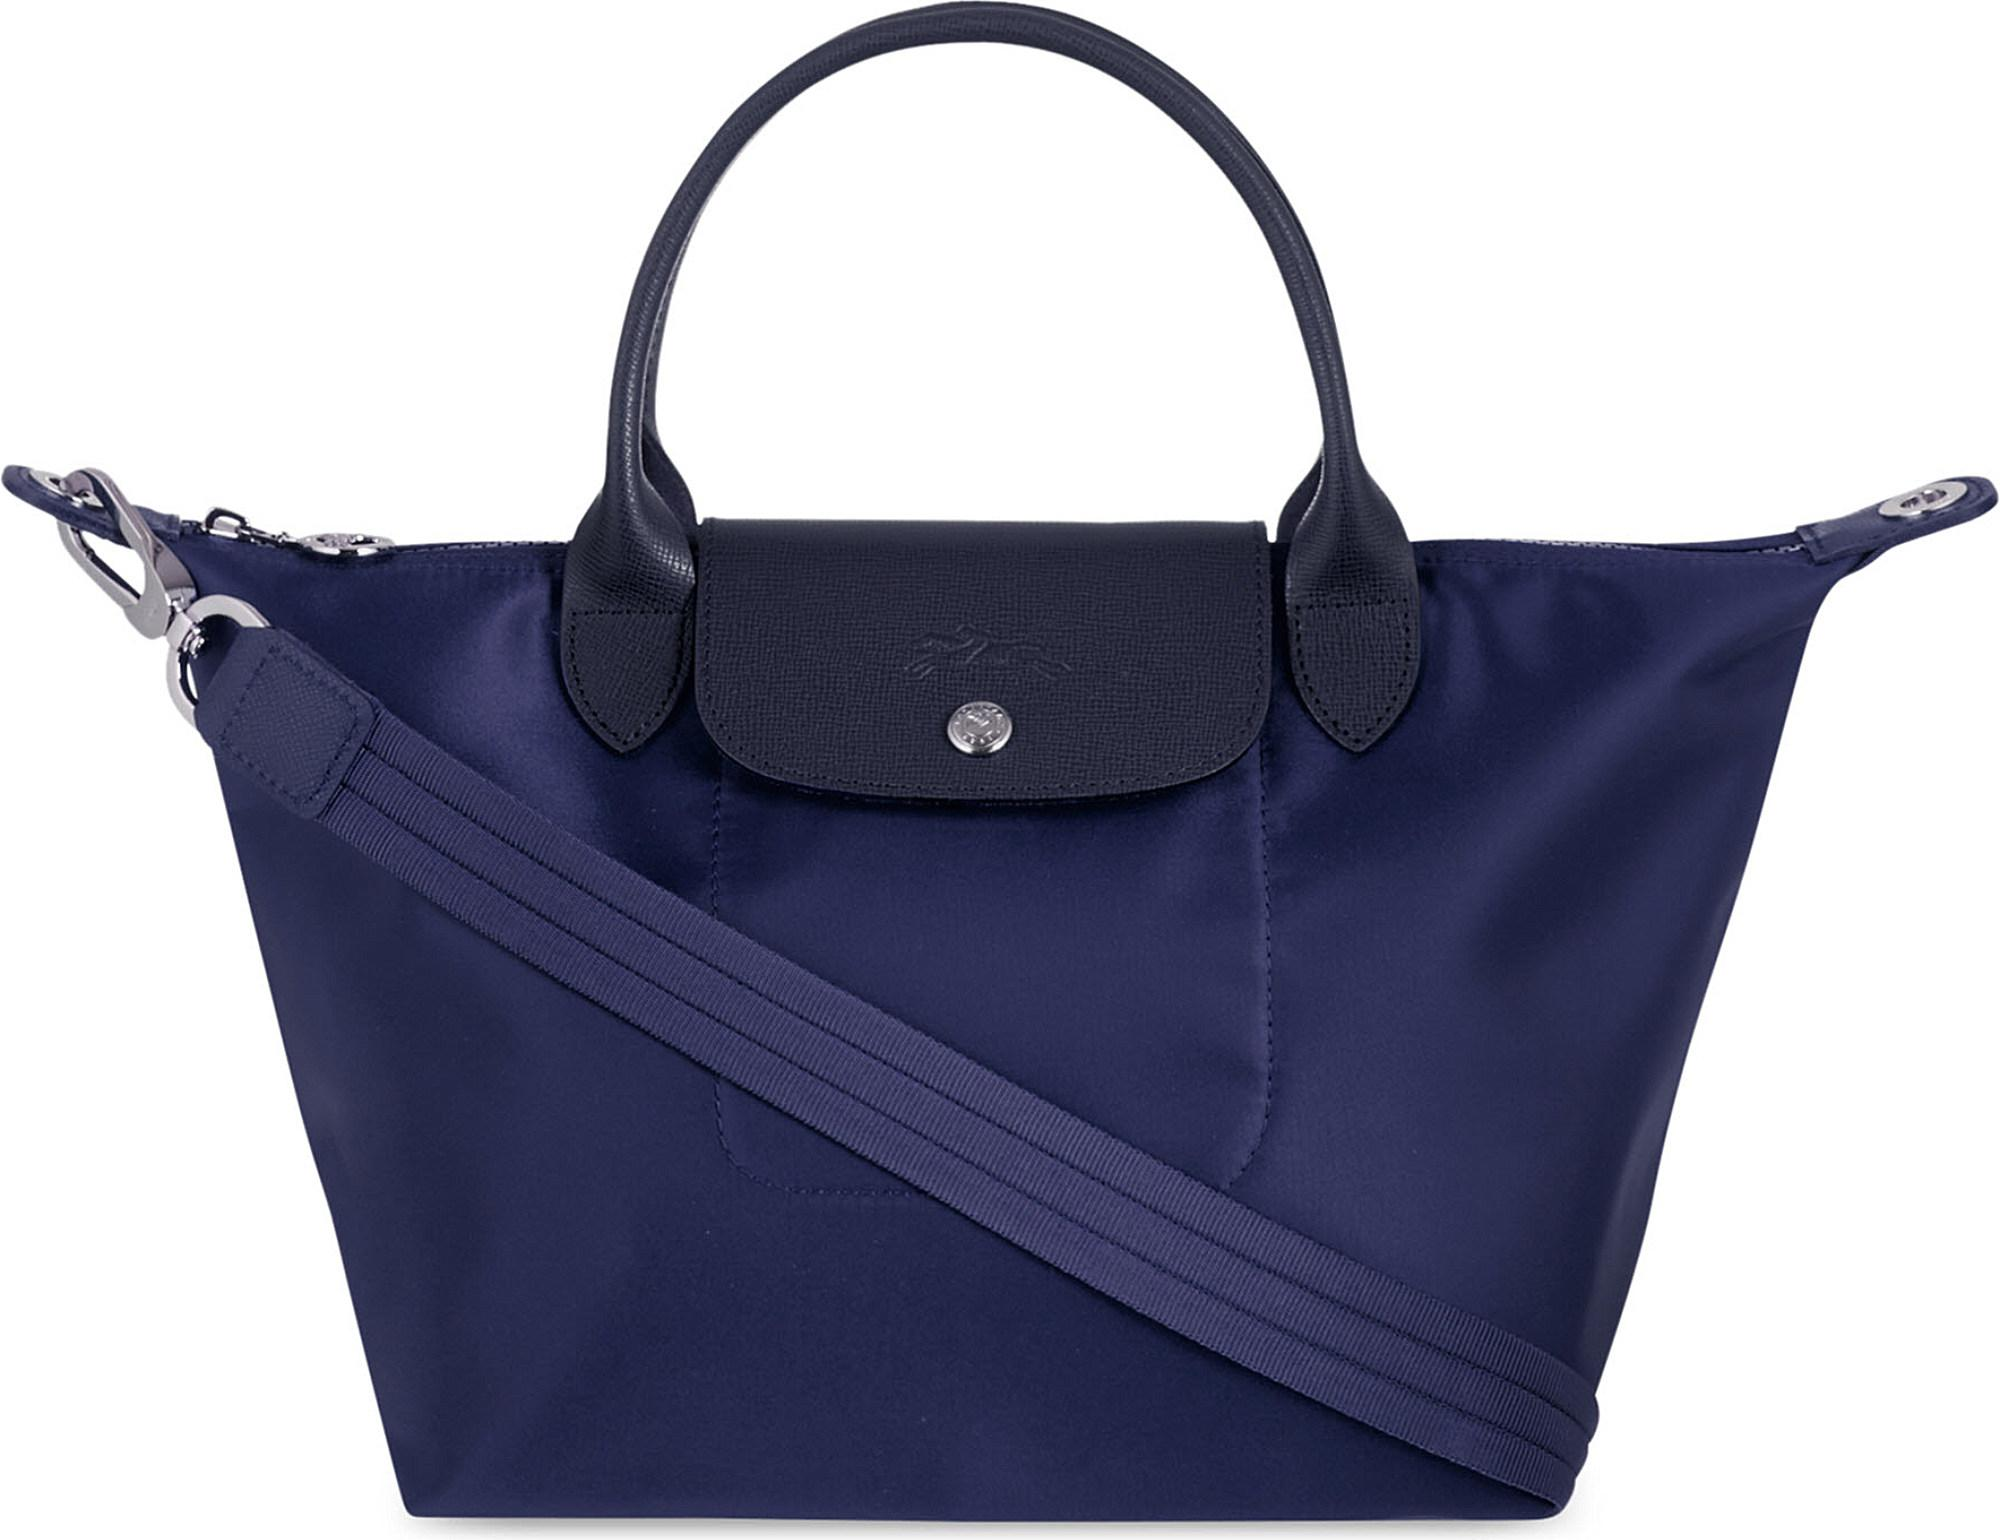 Longchamp Le Pliage Neo Medium Nylon   Leather Tote Bag in Blue - Lyst 873d648bb9d17